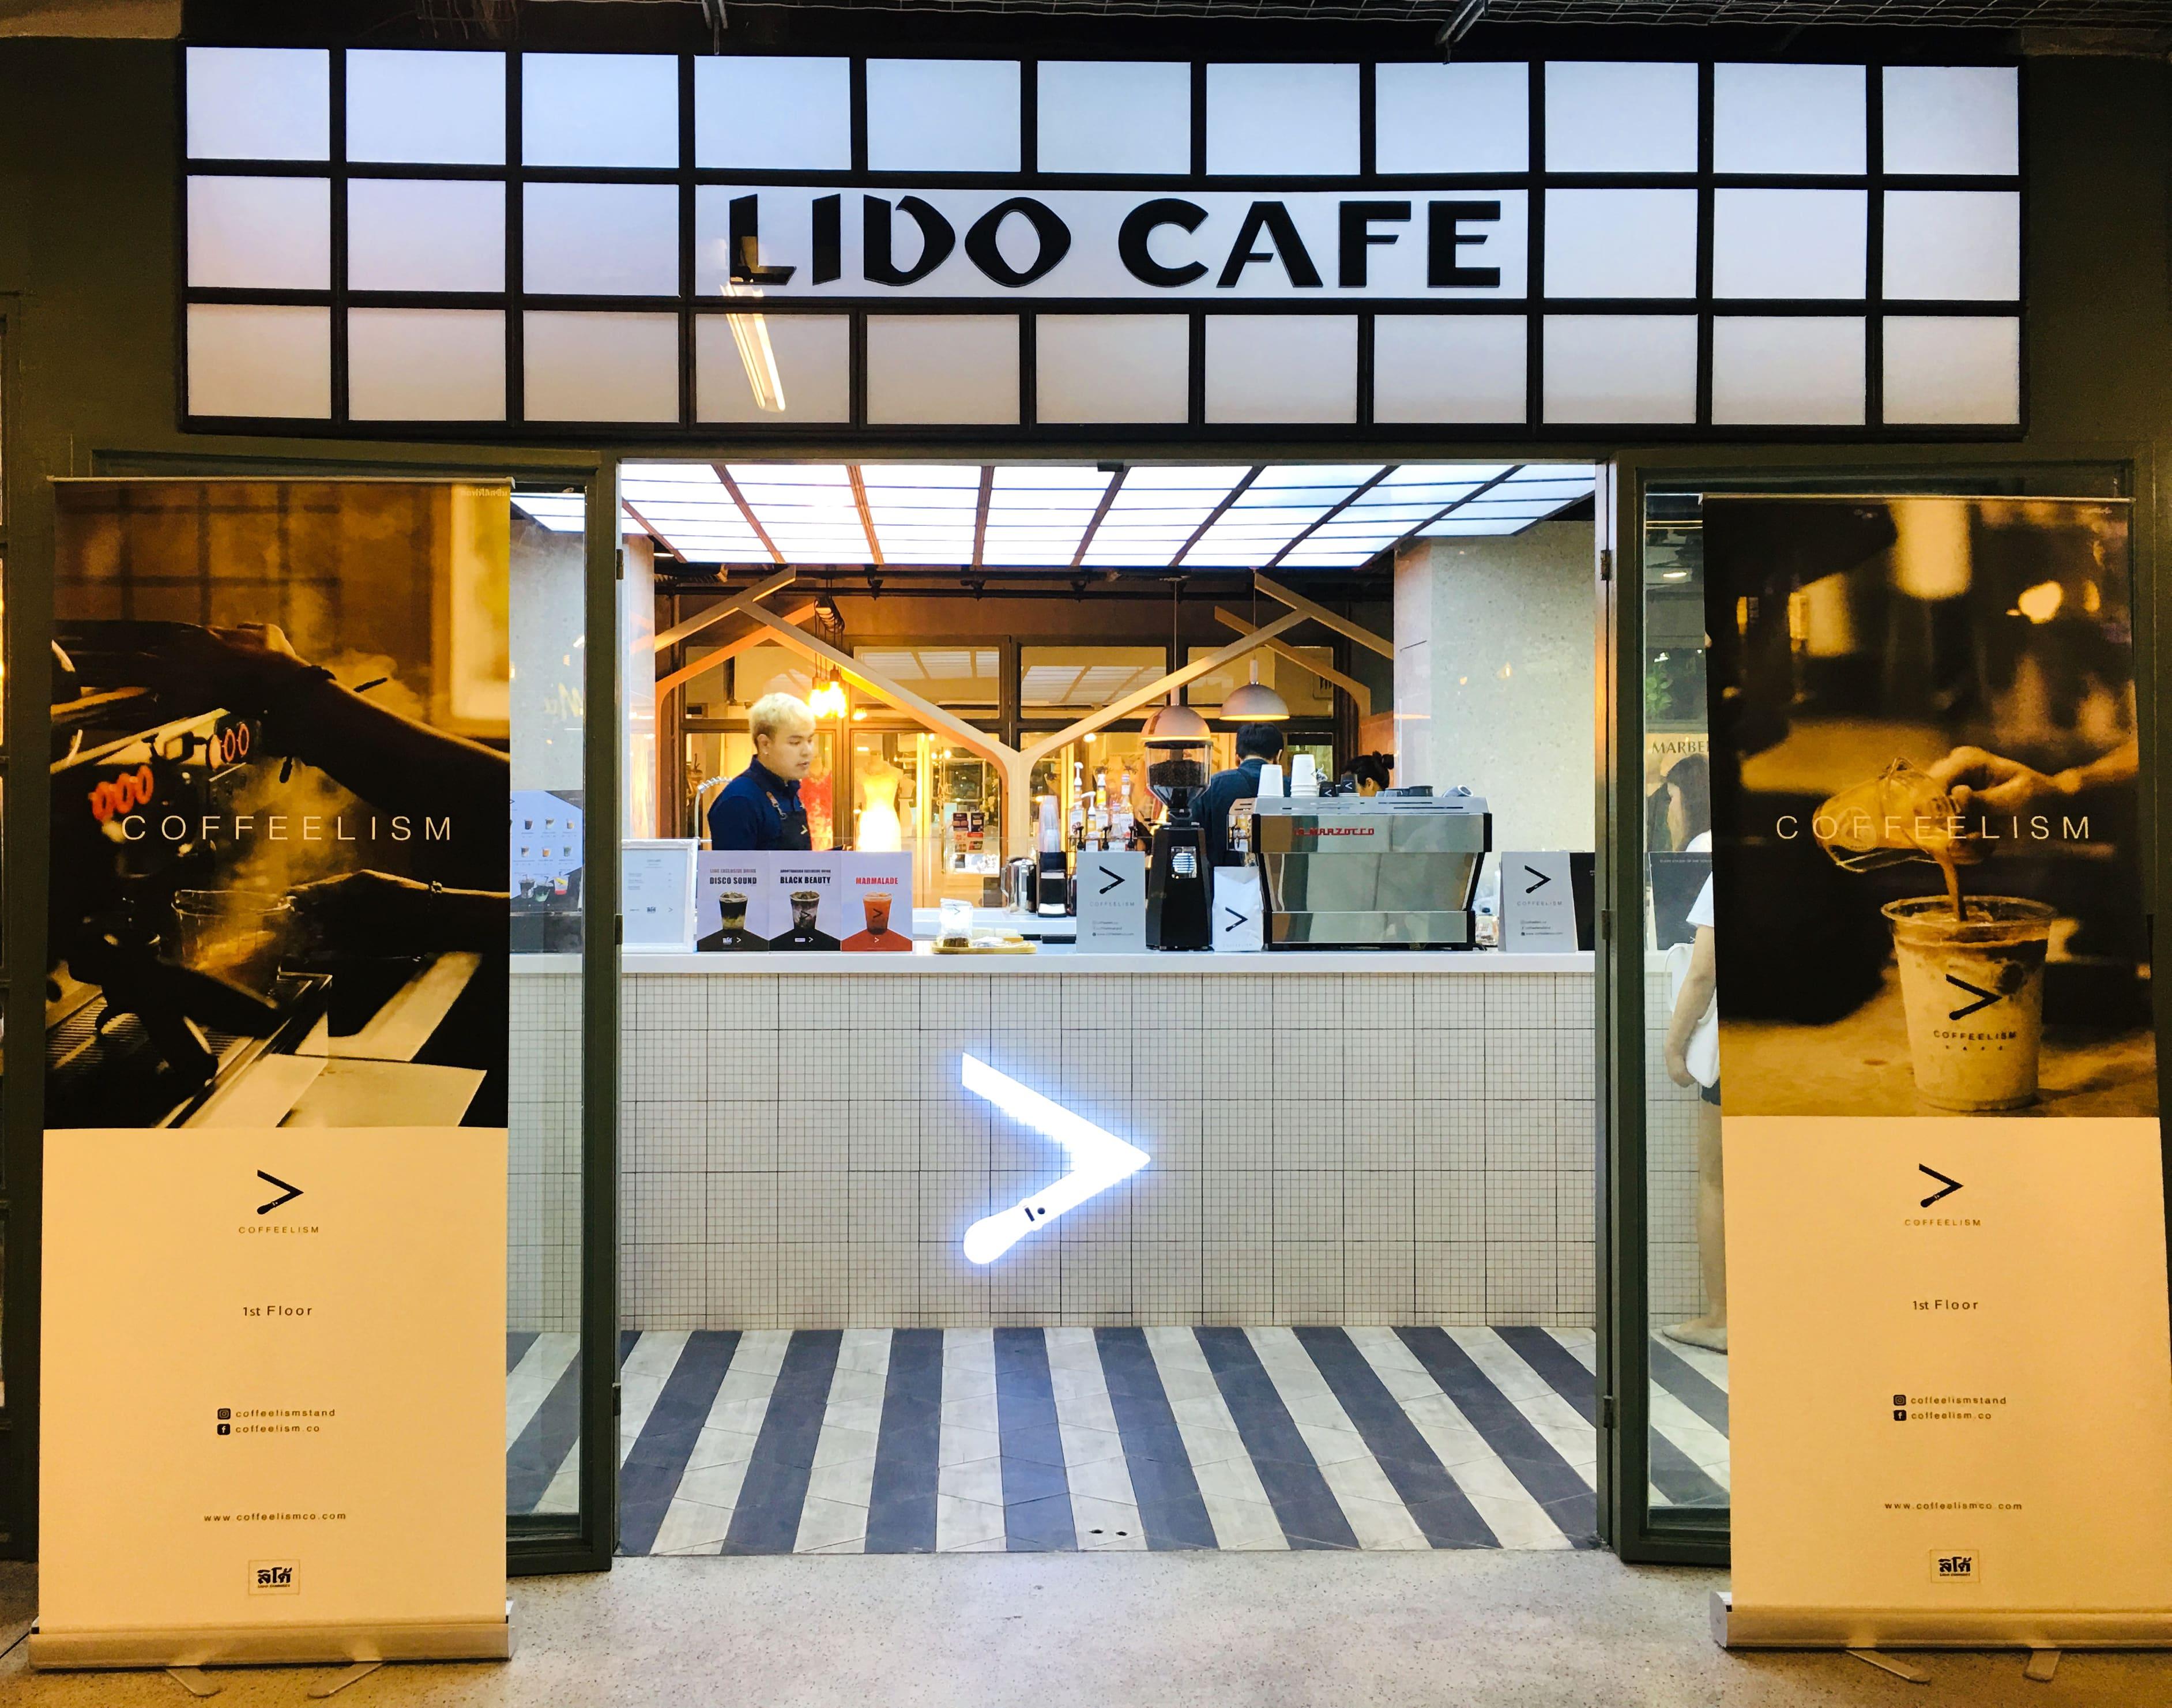 Lido Connect, Lido Theatre, Lido Cinema, Siam Square, Siam, revamped Lido Connect, Art gallery, Instagram worthy backdrop, Instgrammable, artsy backdrop, Lido backdrop, Lido Cafe, Coffeelism